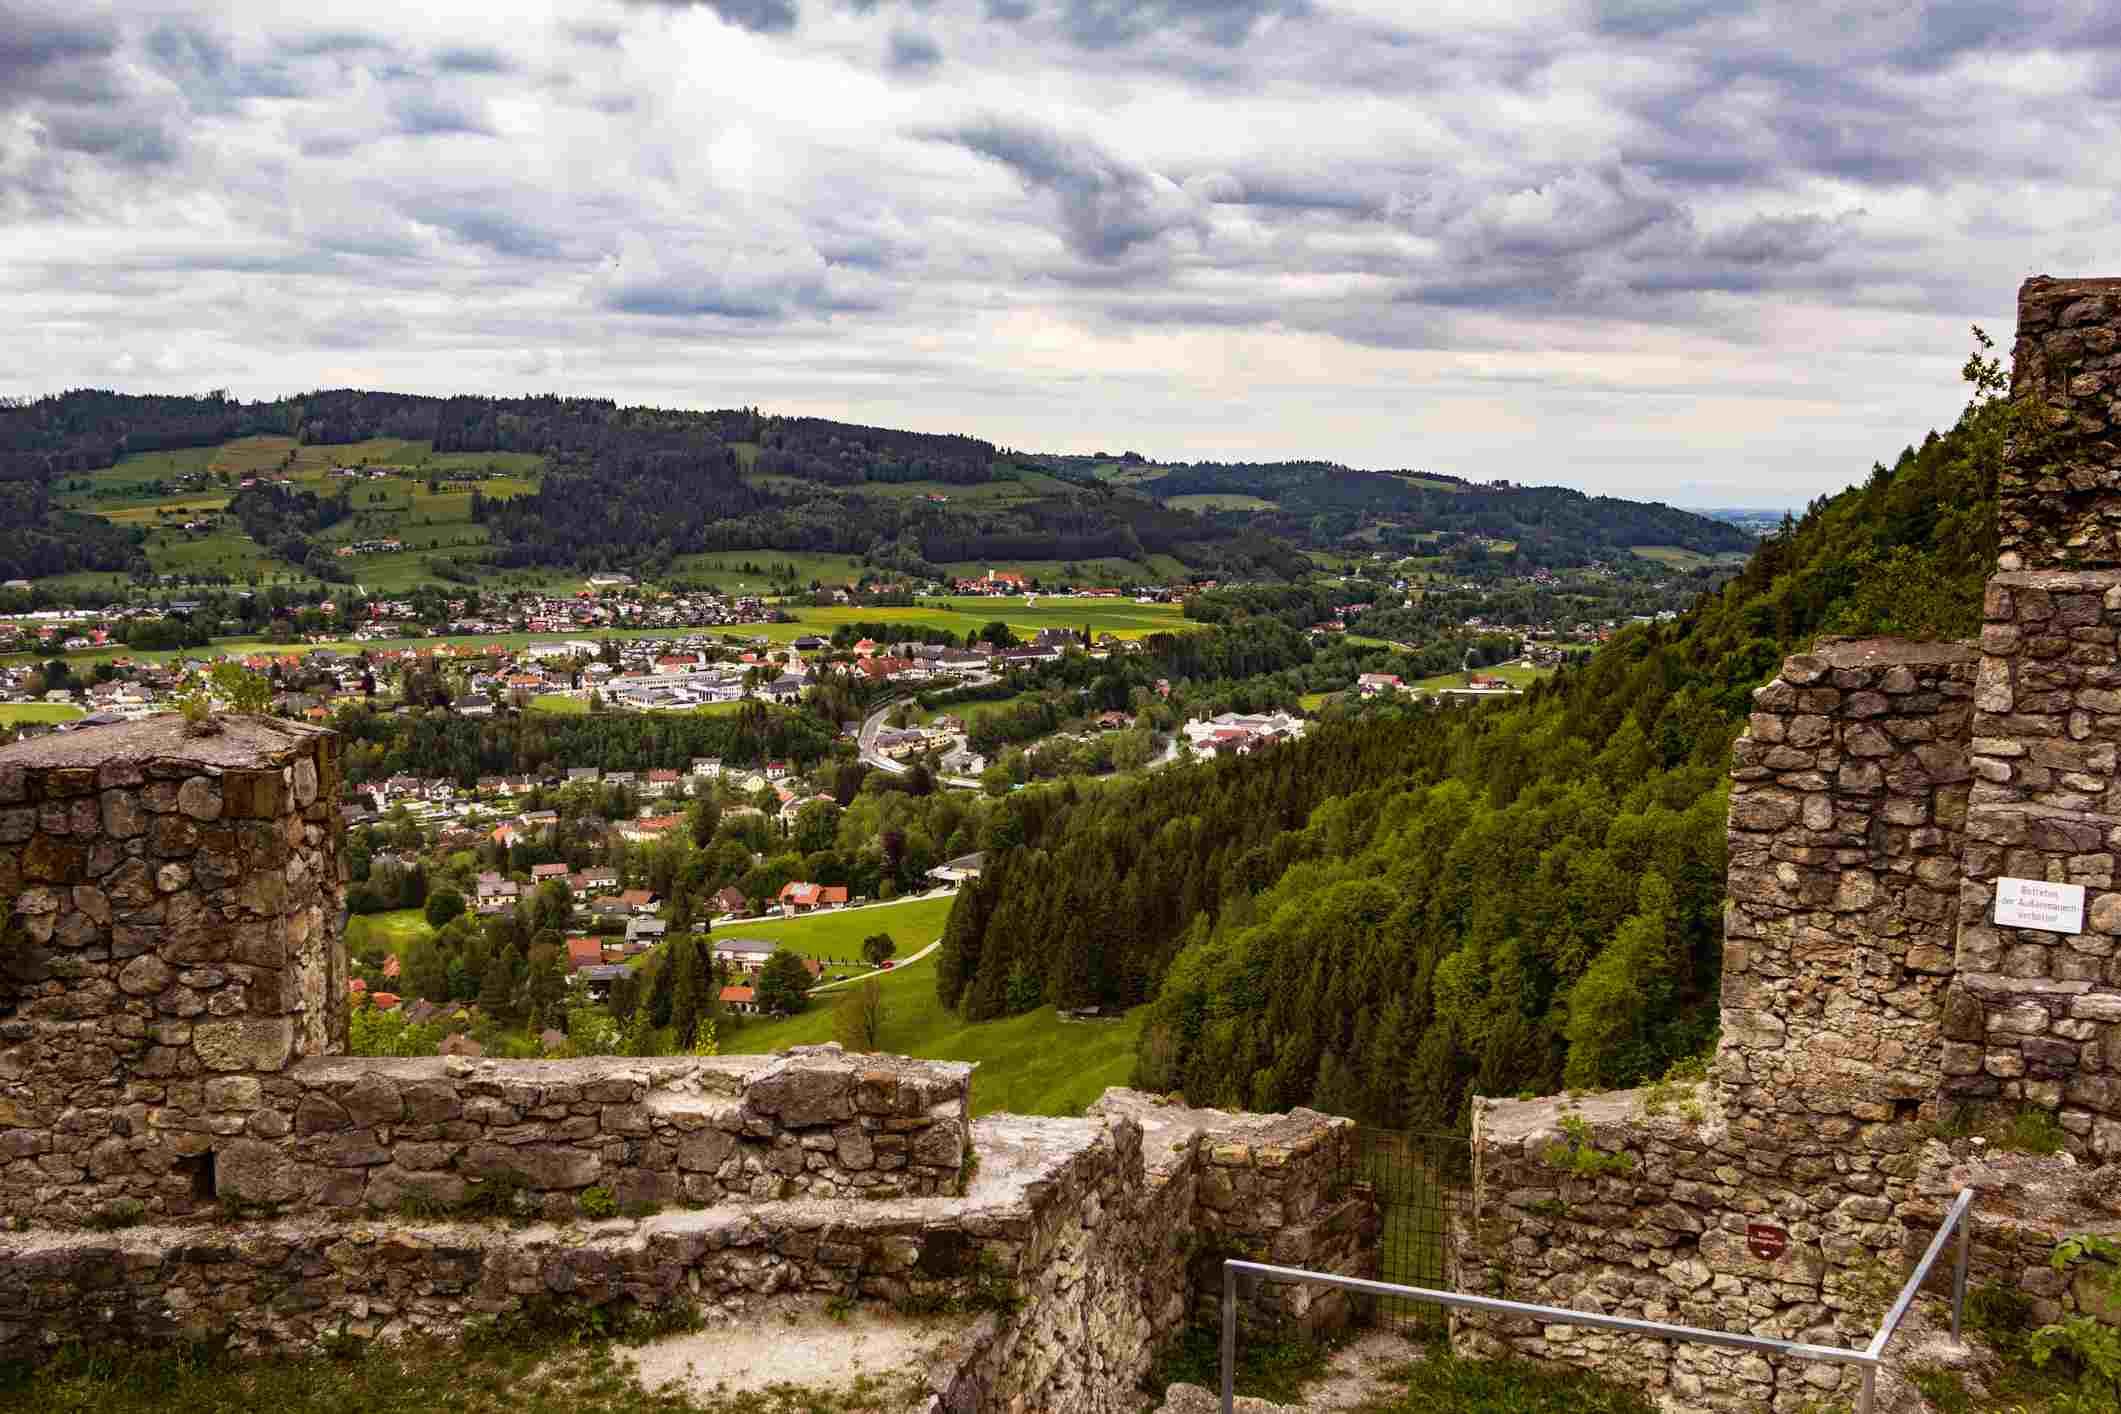 View from the Scharnstein Ruins, Austria